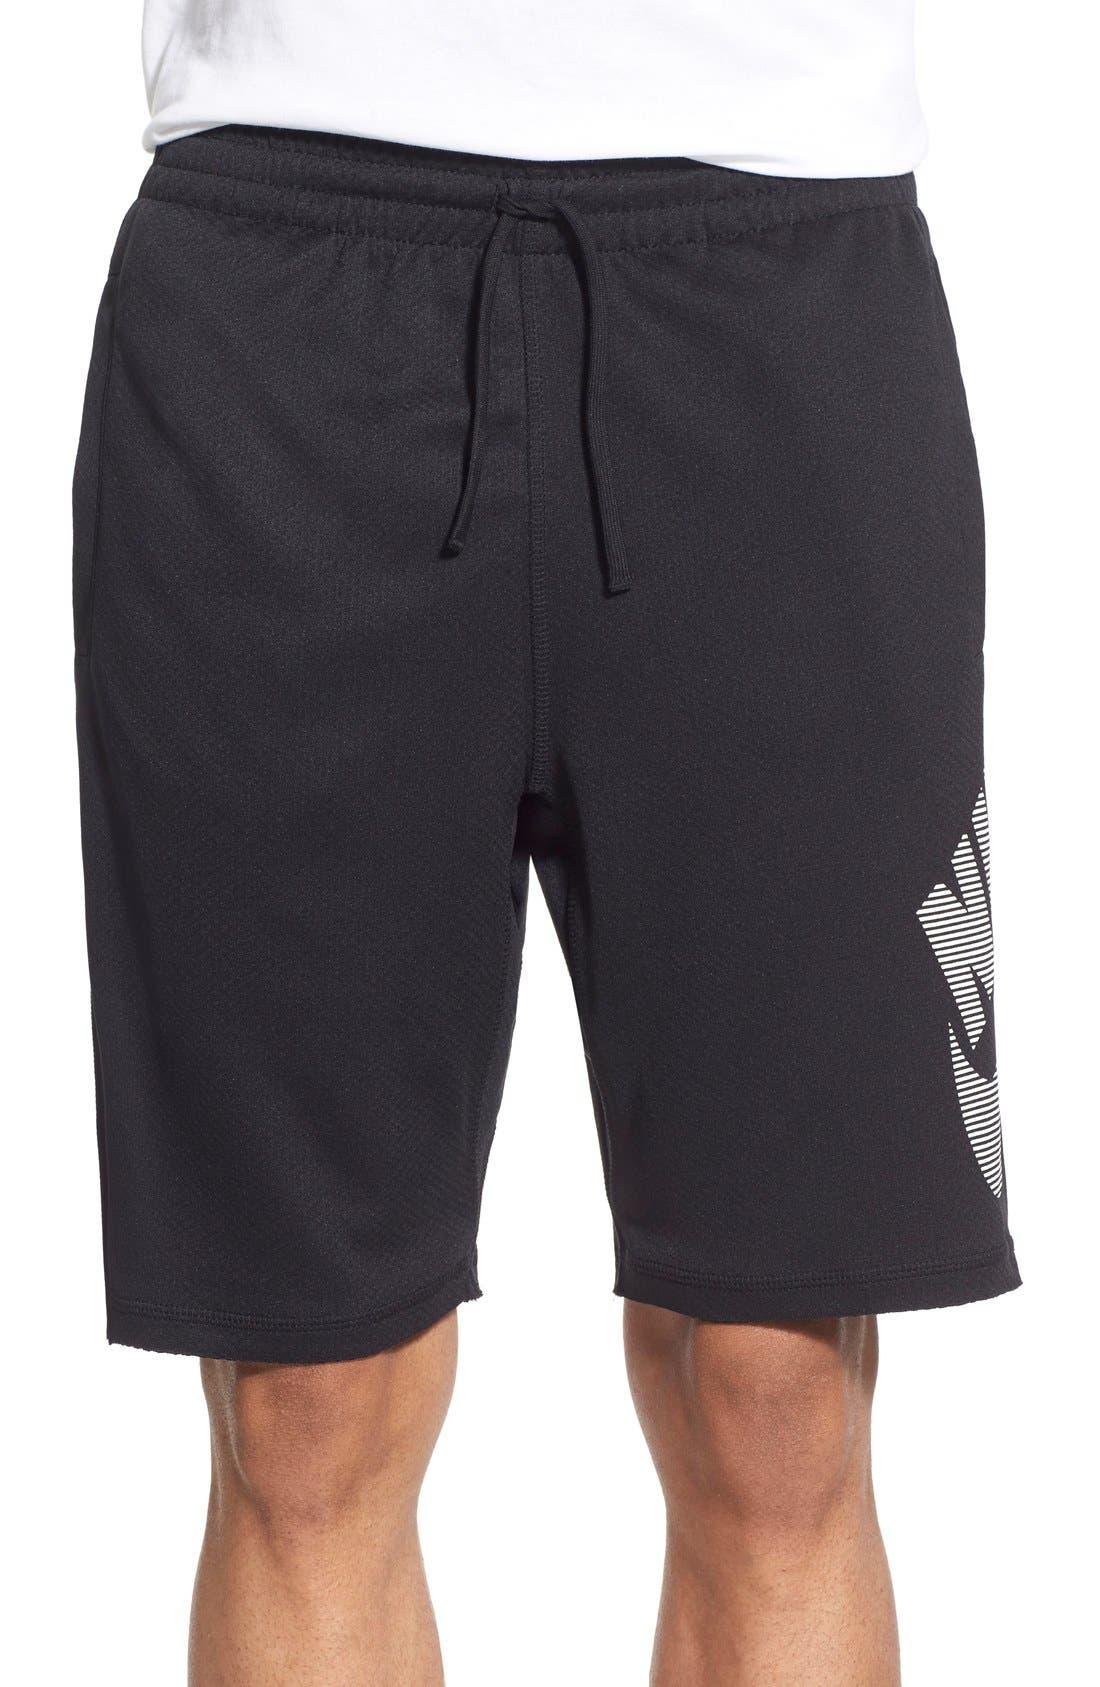 SB 'Stripe Sunday' Dri-FIT Shorts,                         Main,                         color, 010